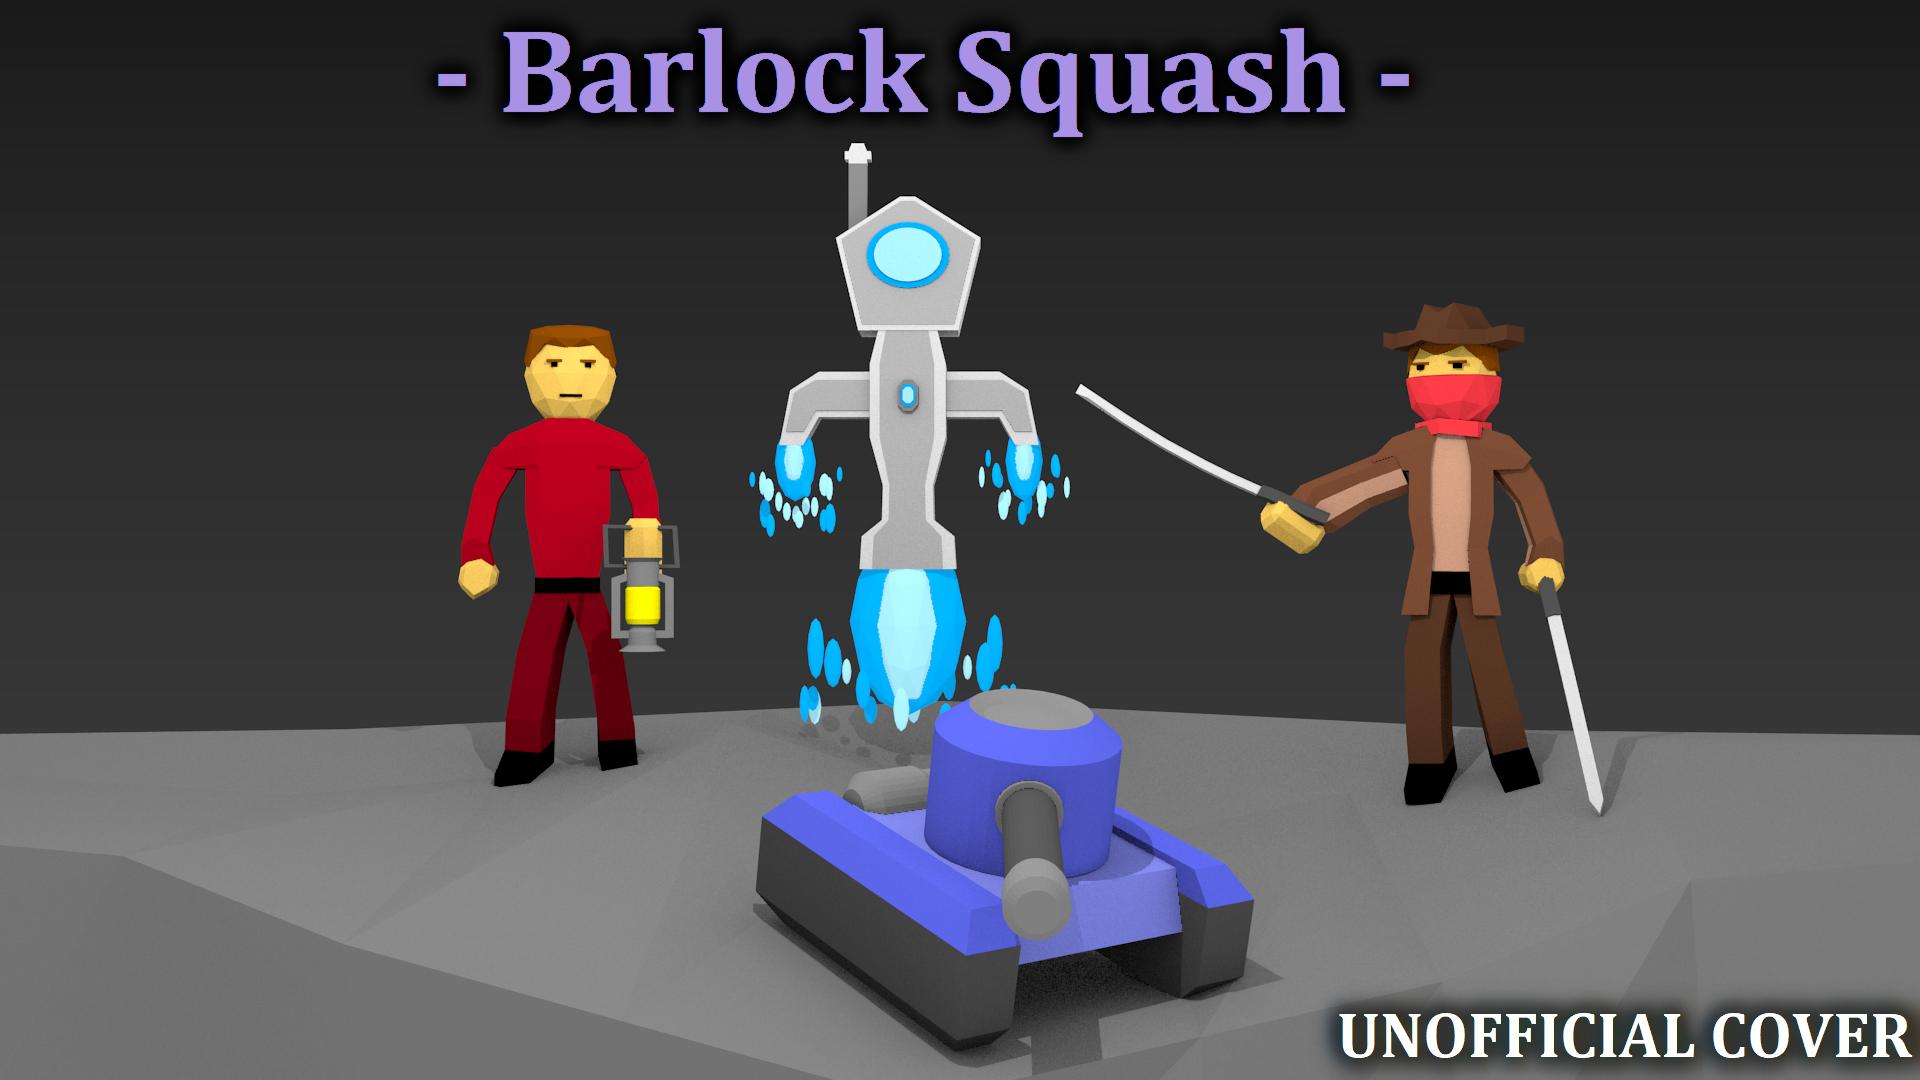 BarlockSquashPrototypeCover